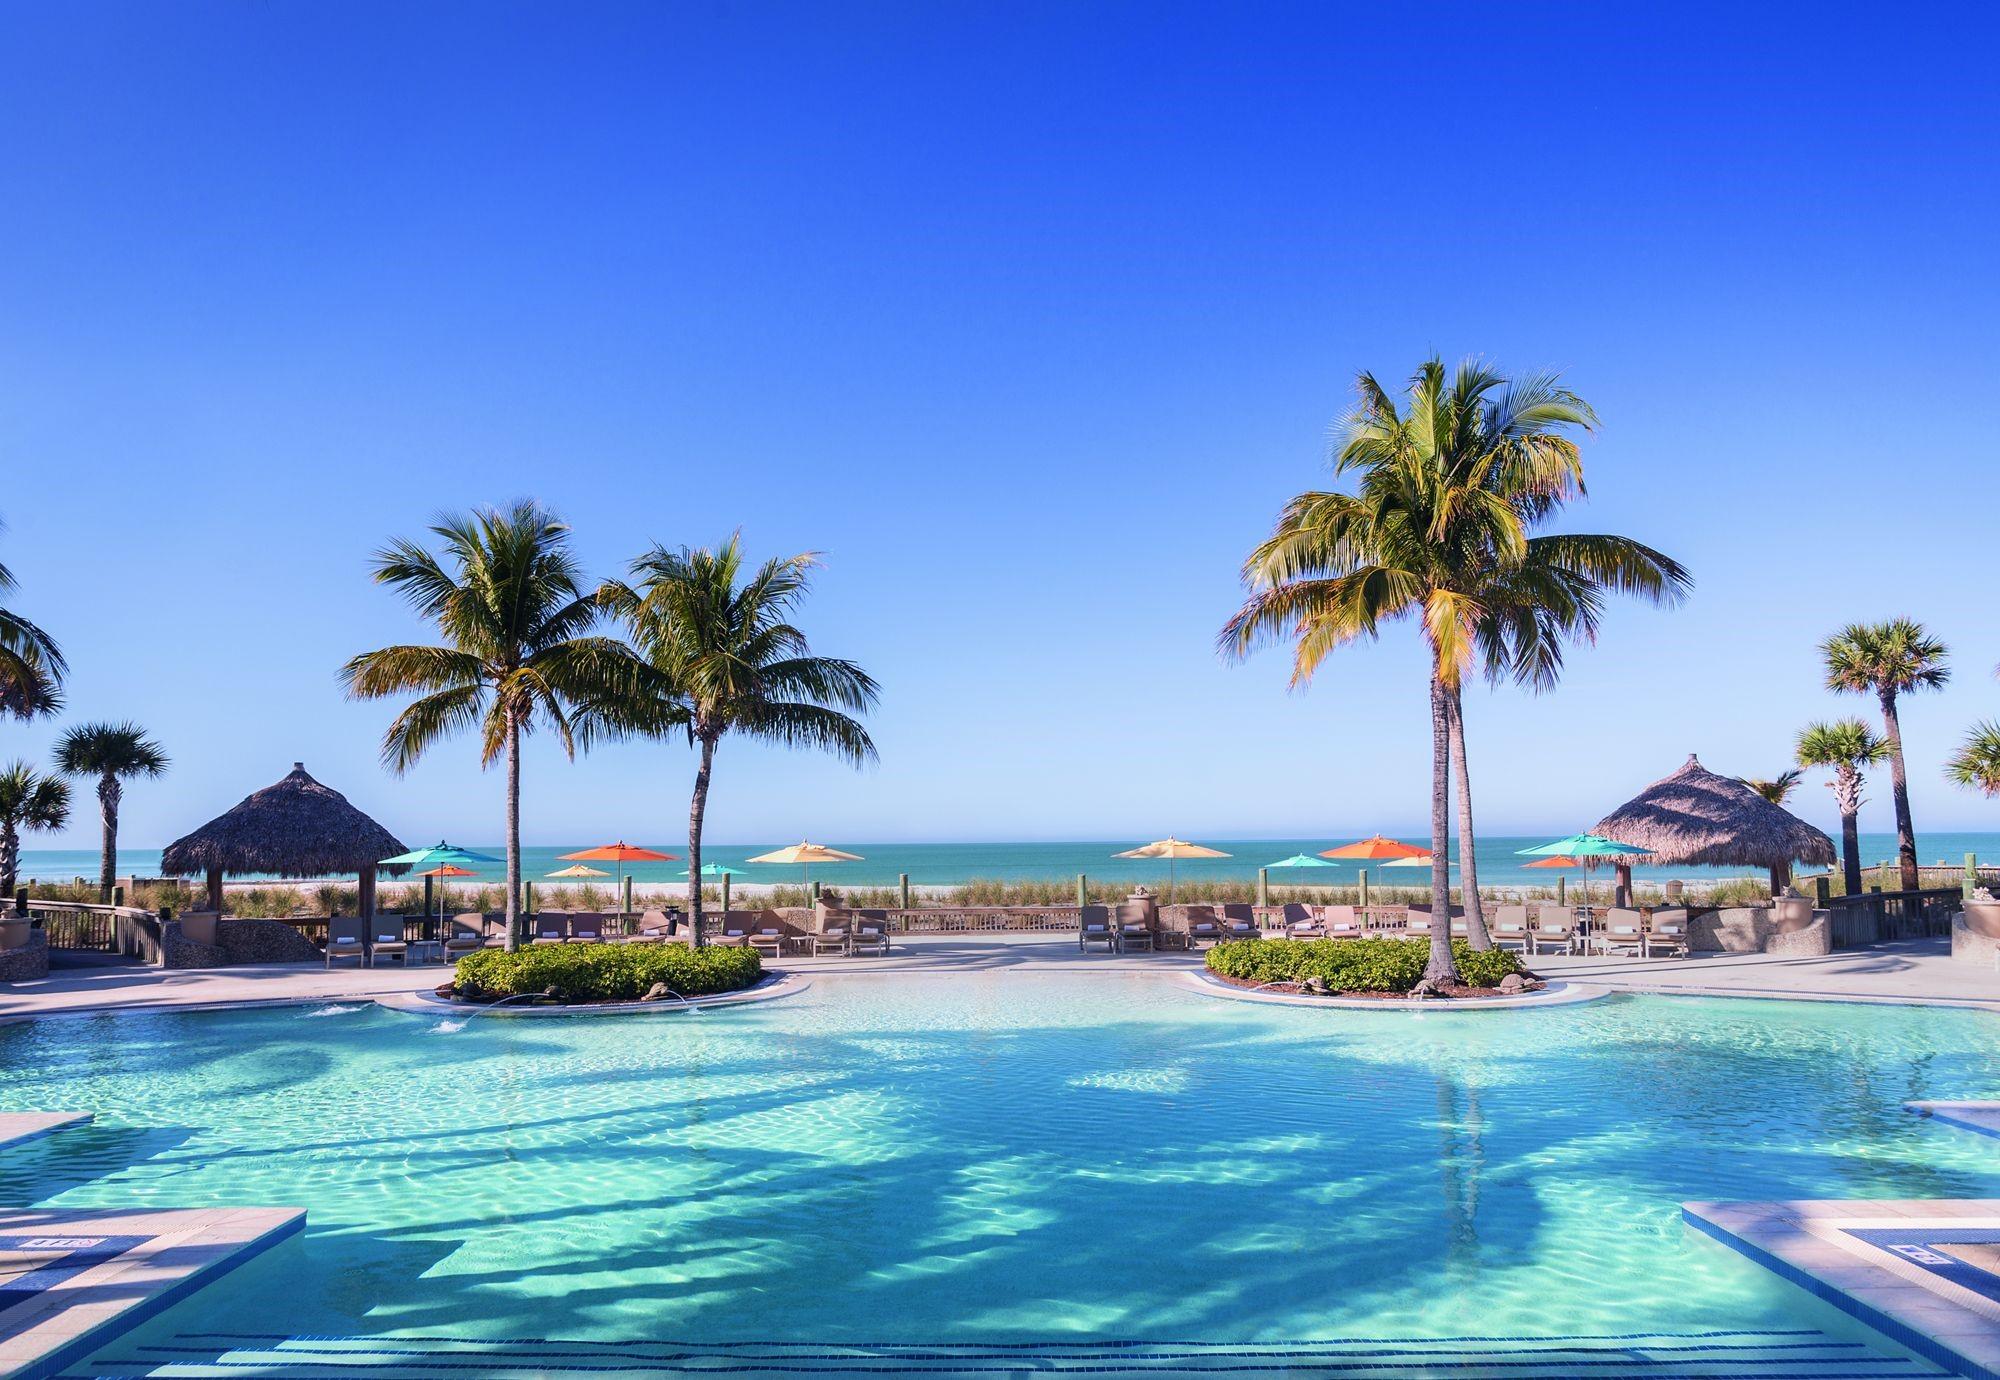 Ritz Beach Club Sarasota